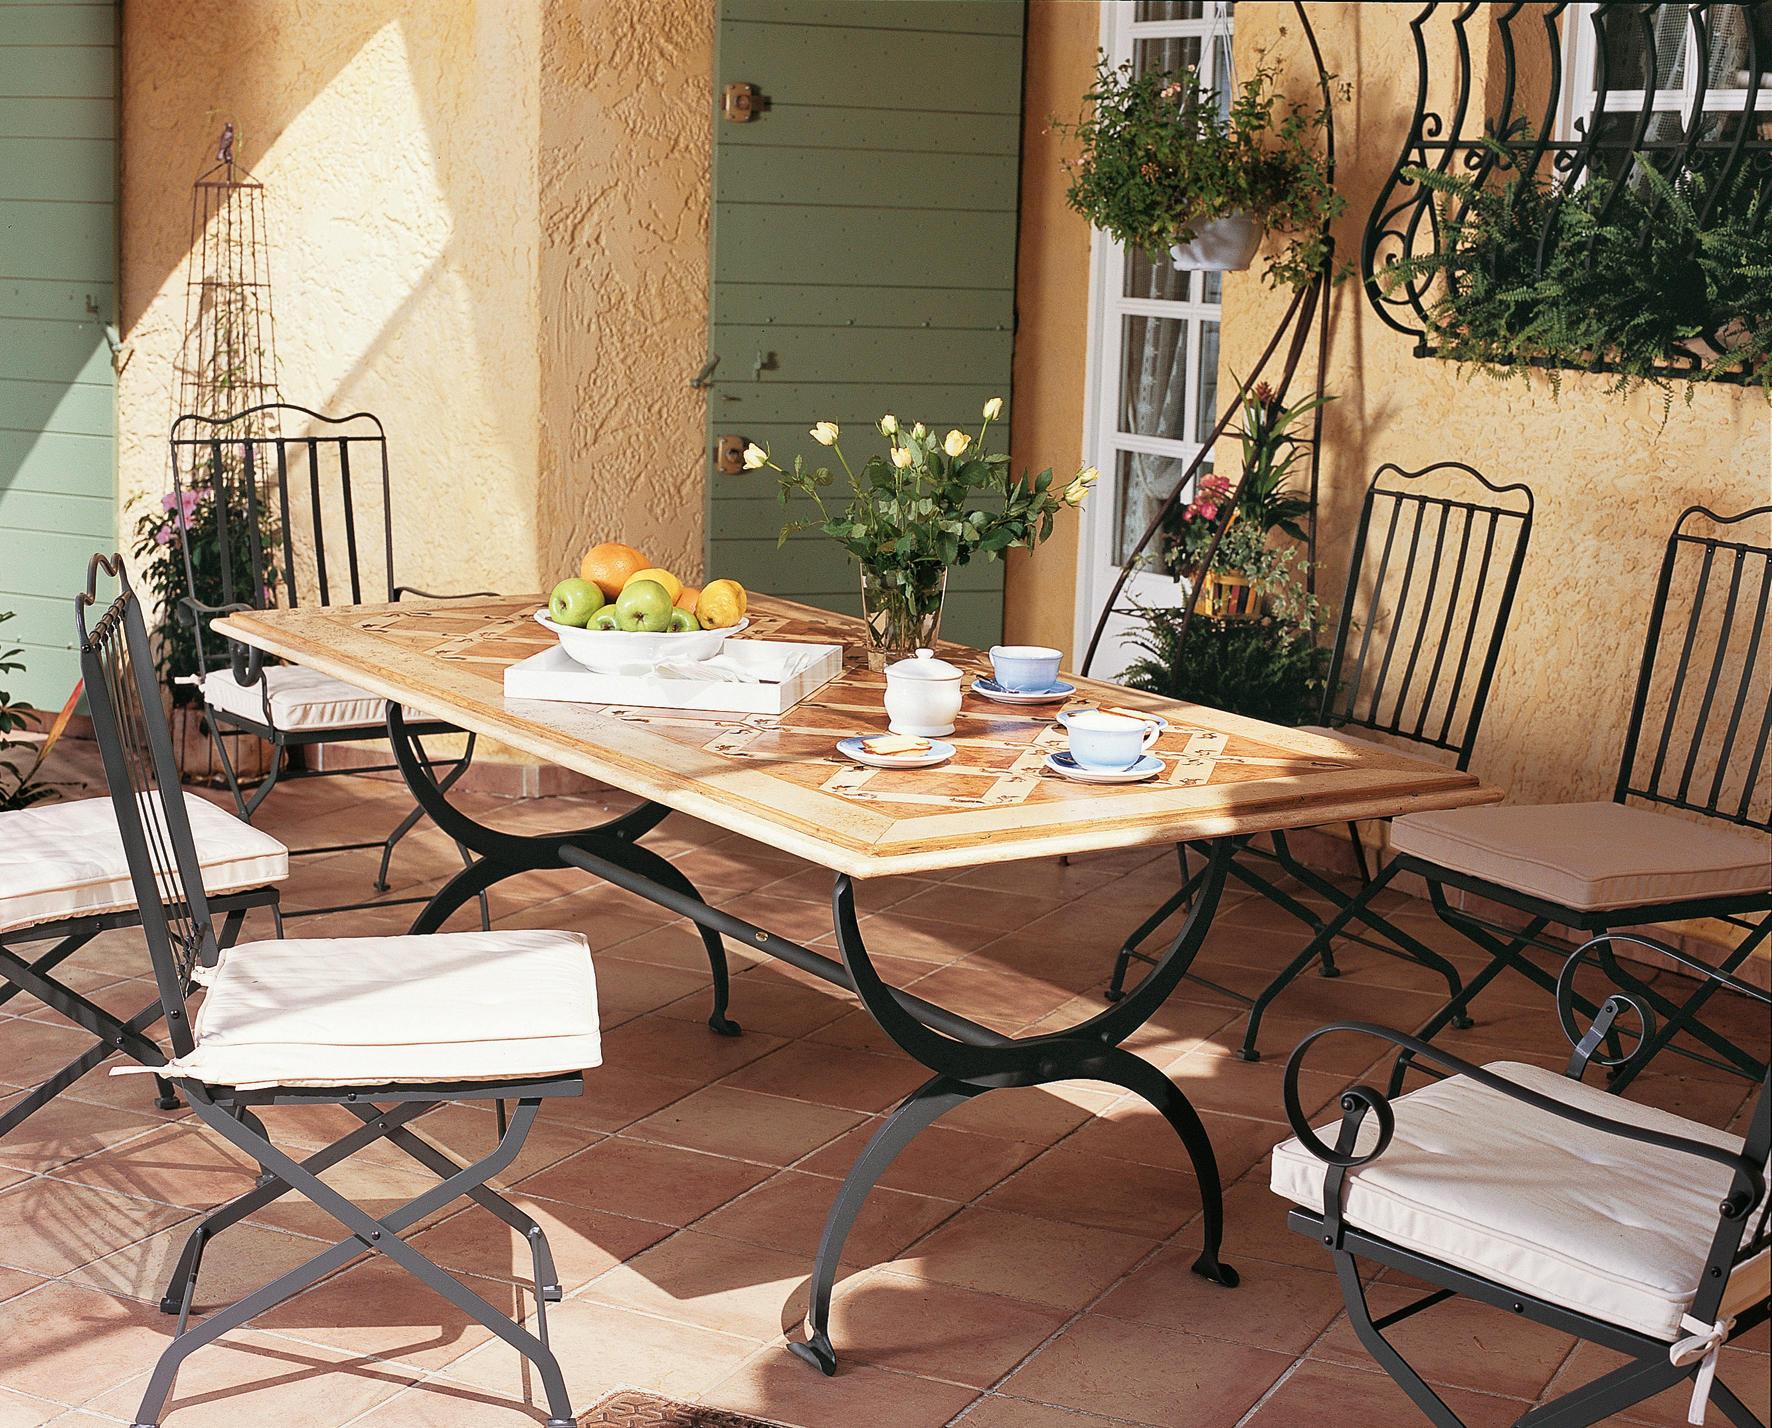 Osiride tavolo tavoli da pranzo da giardino unopi for Produttori tavoli